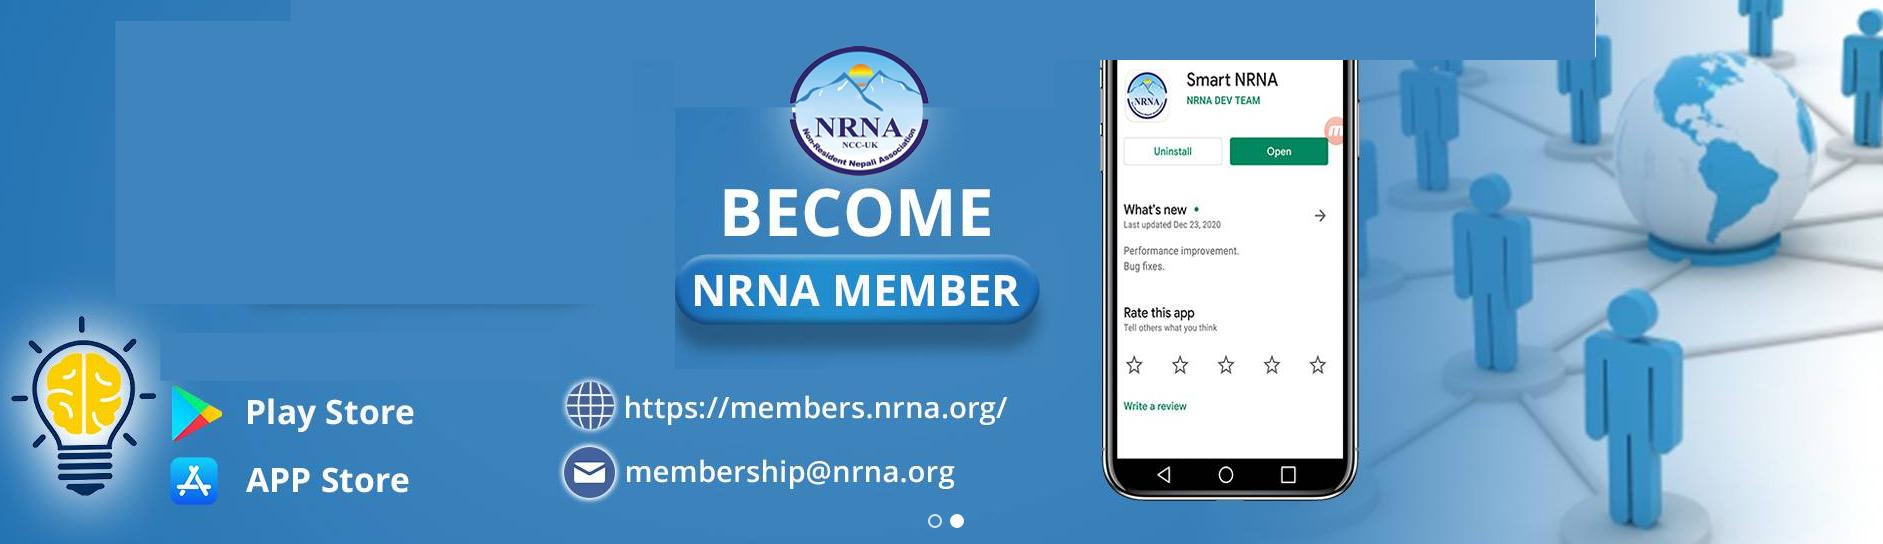 Become NRNA Member